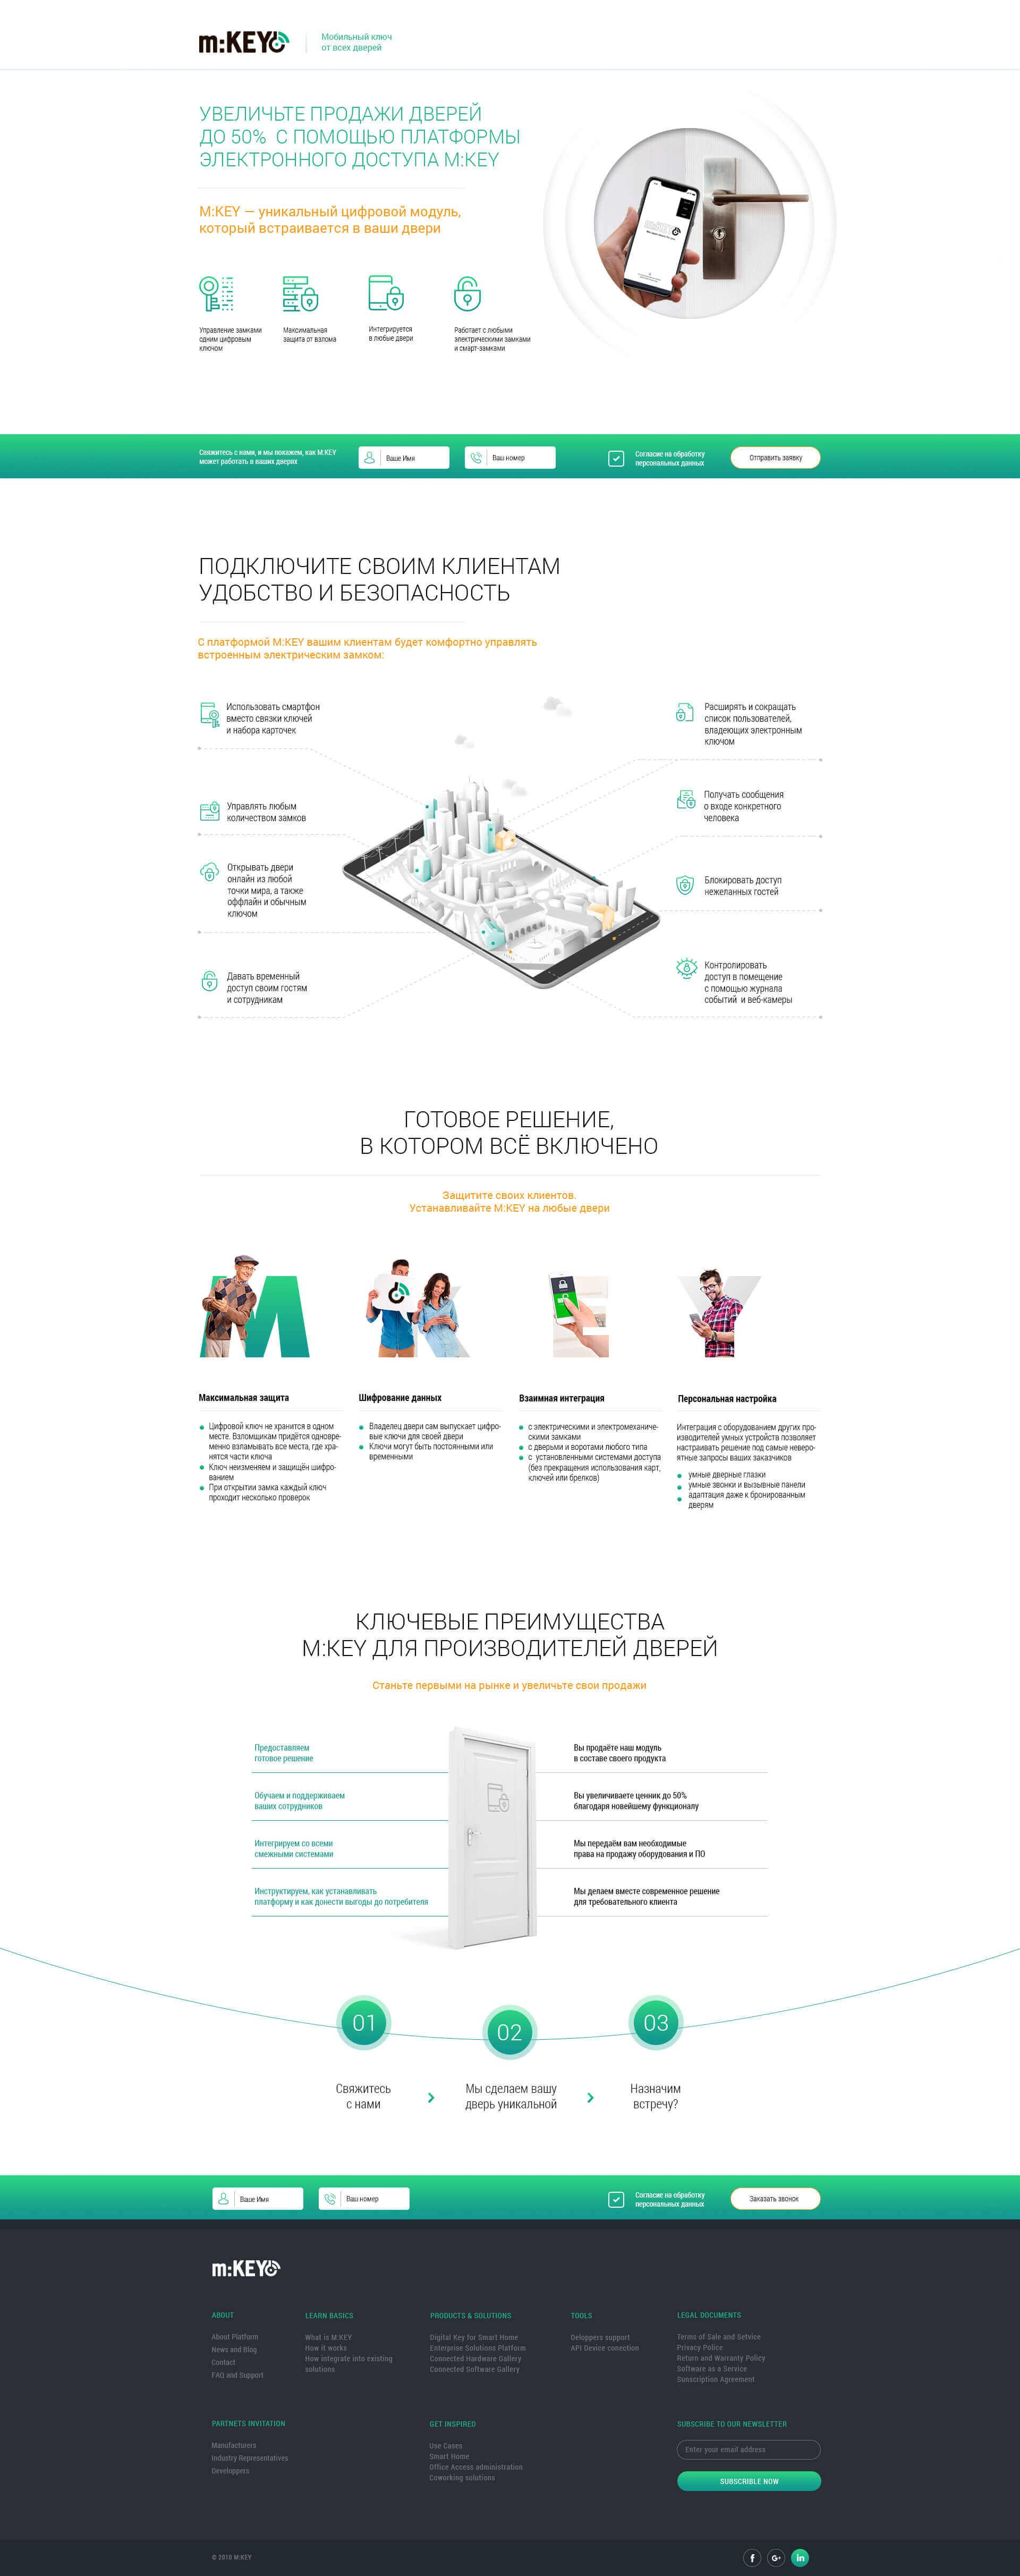 Разработка сайта для стартапа на заказ в Москве